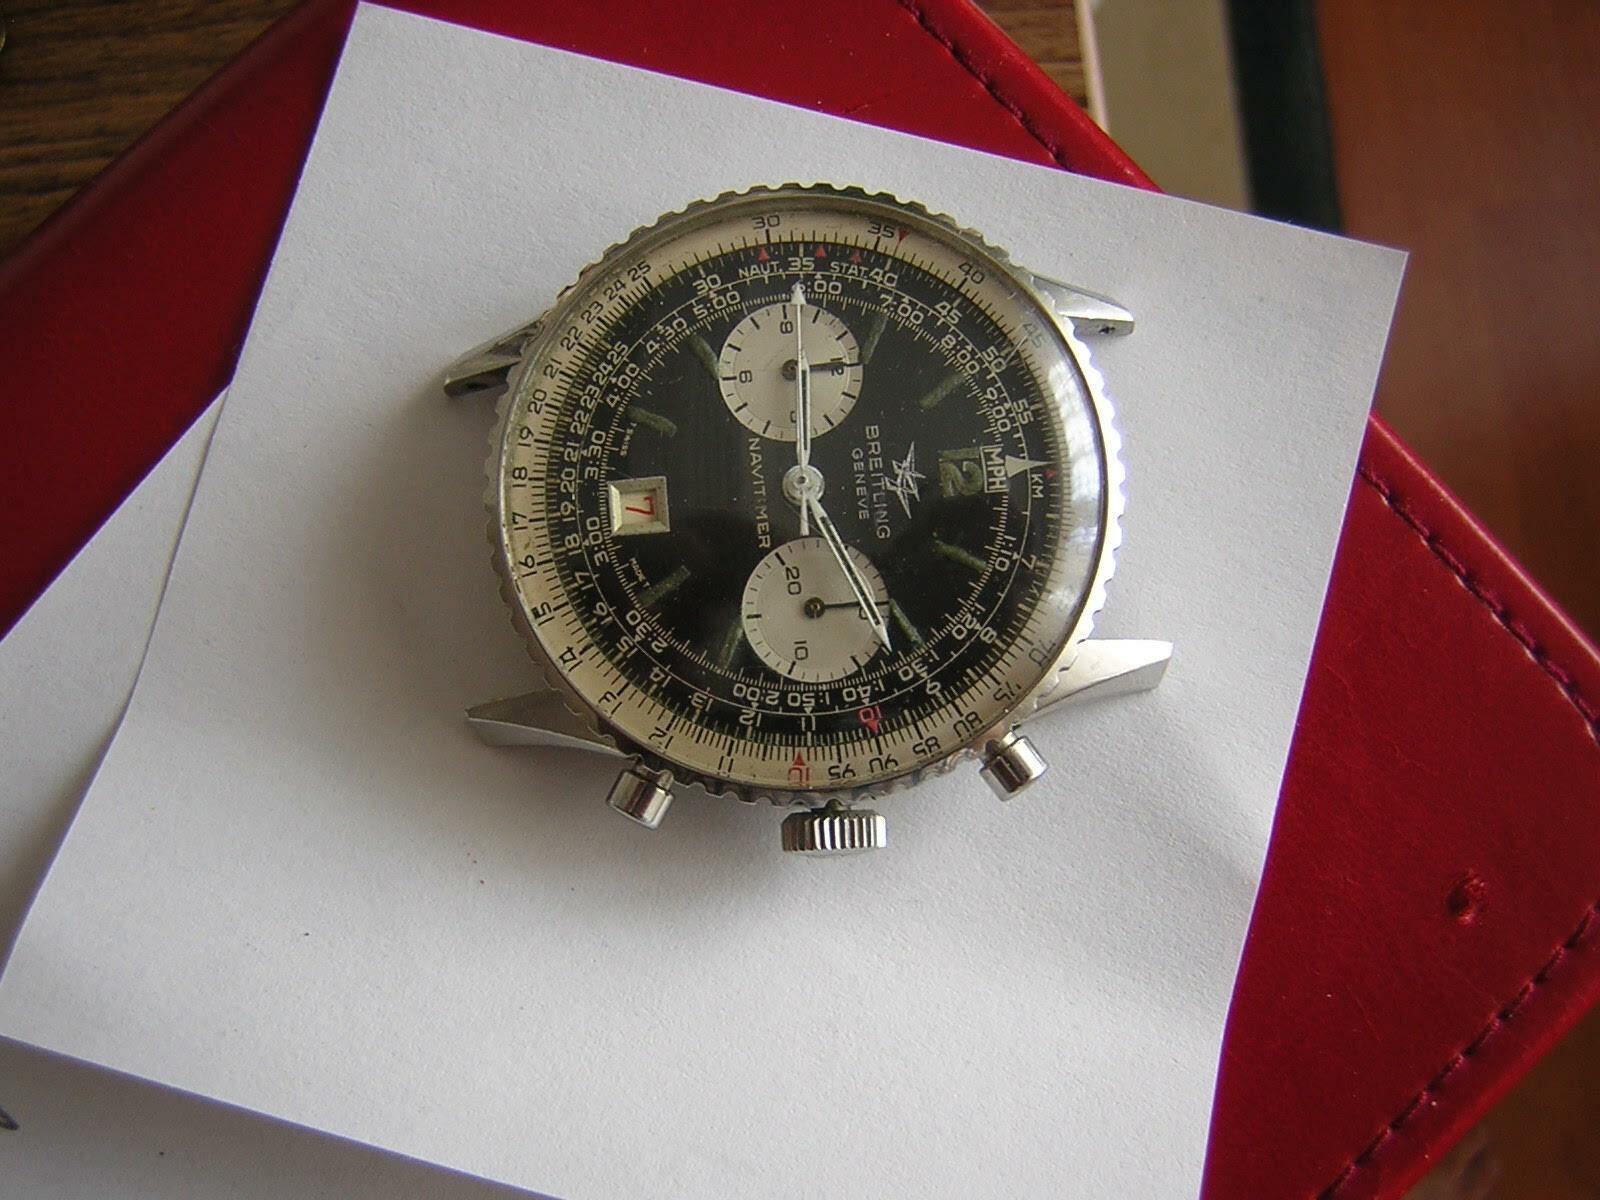 VINTAGE BREITLING NAVITIMER 7806-S 2 REGISTER IN EXCELLENT ORIGINAL CONDITION - watch picture 1